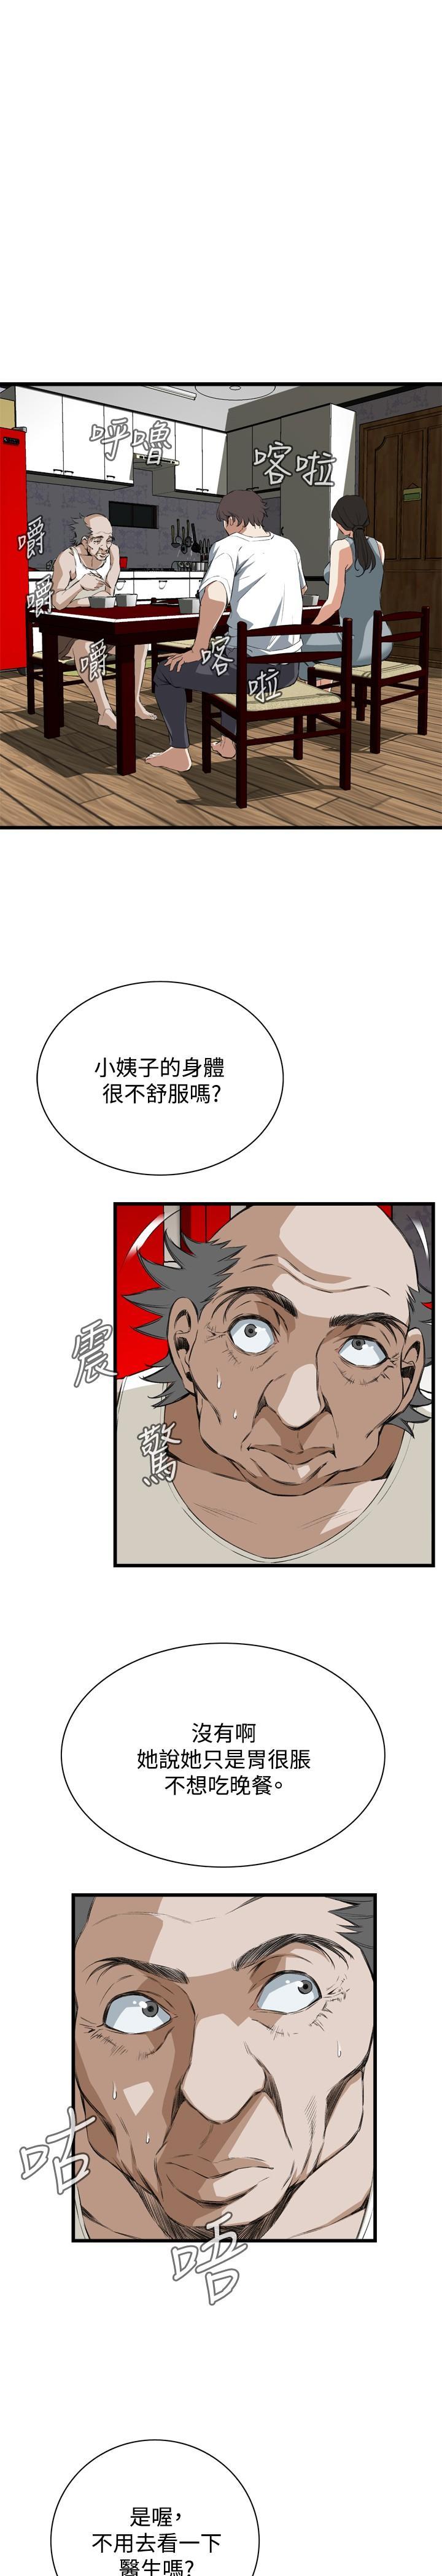 Take a Peek 偷窥 Ch.39~55 [Chinese]中文 384